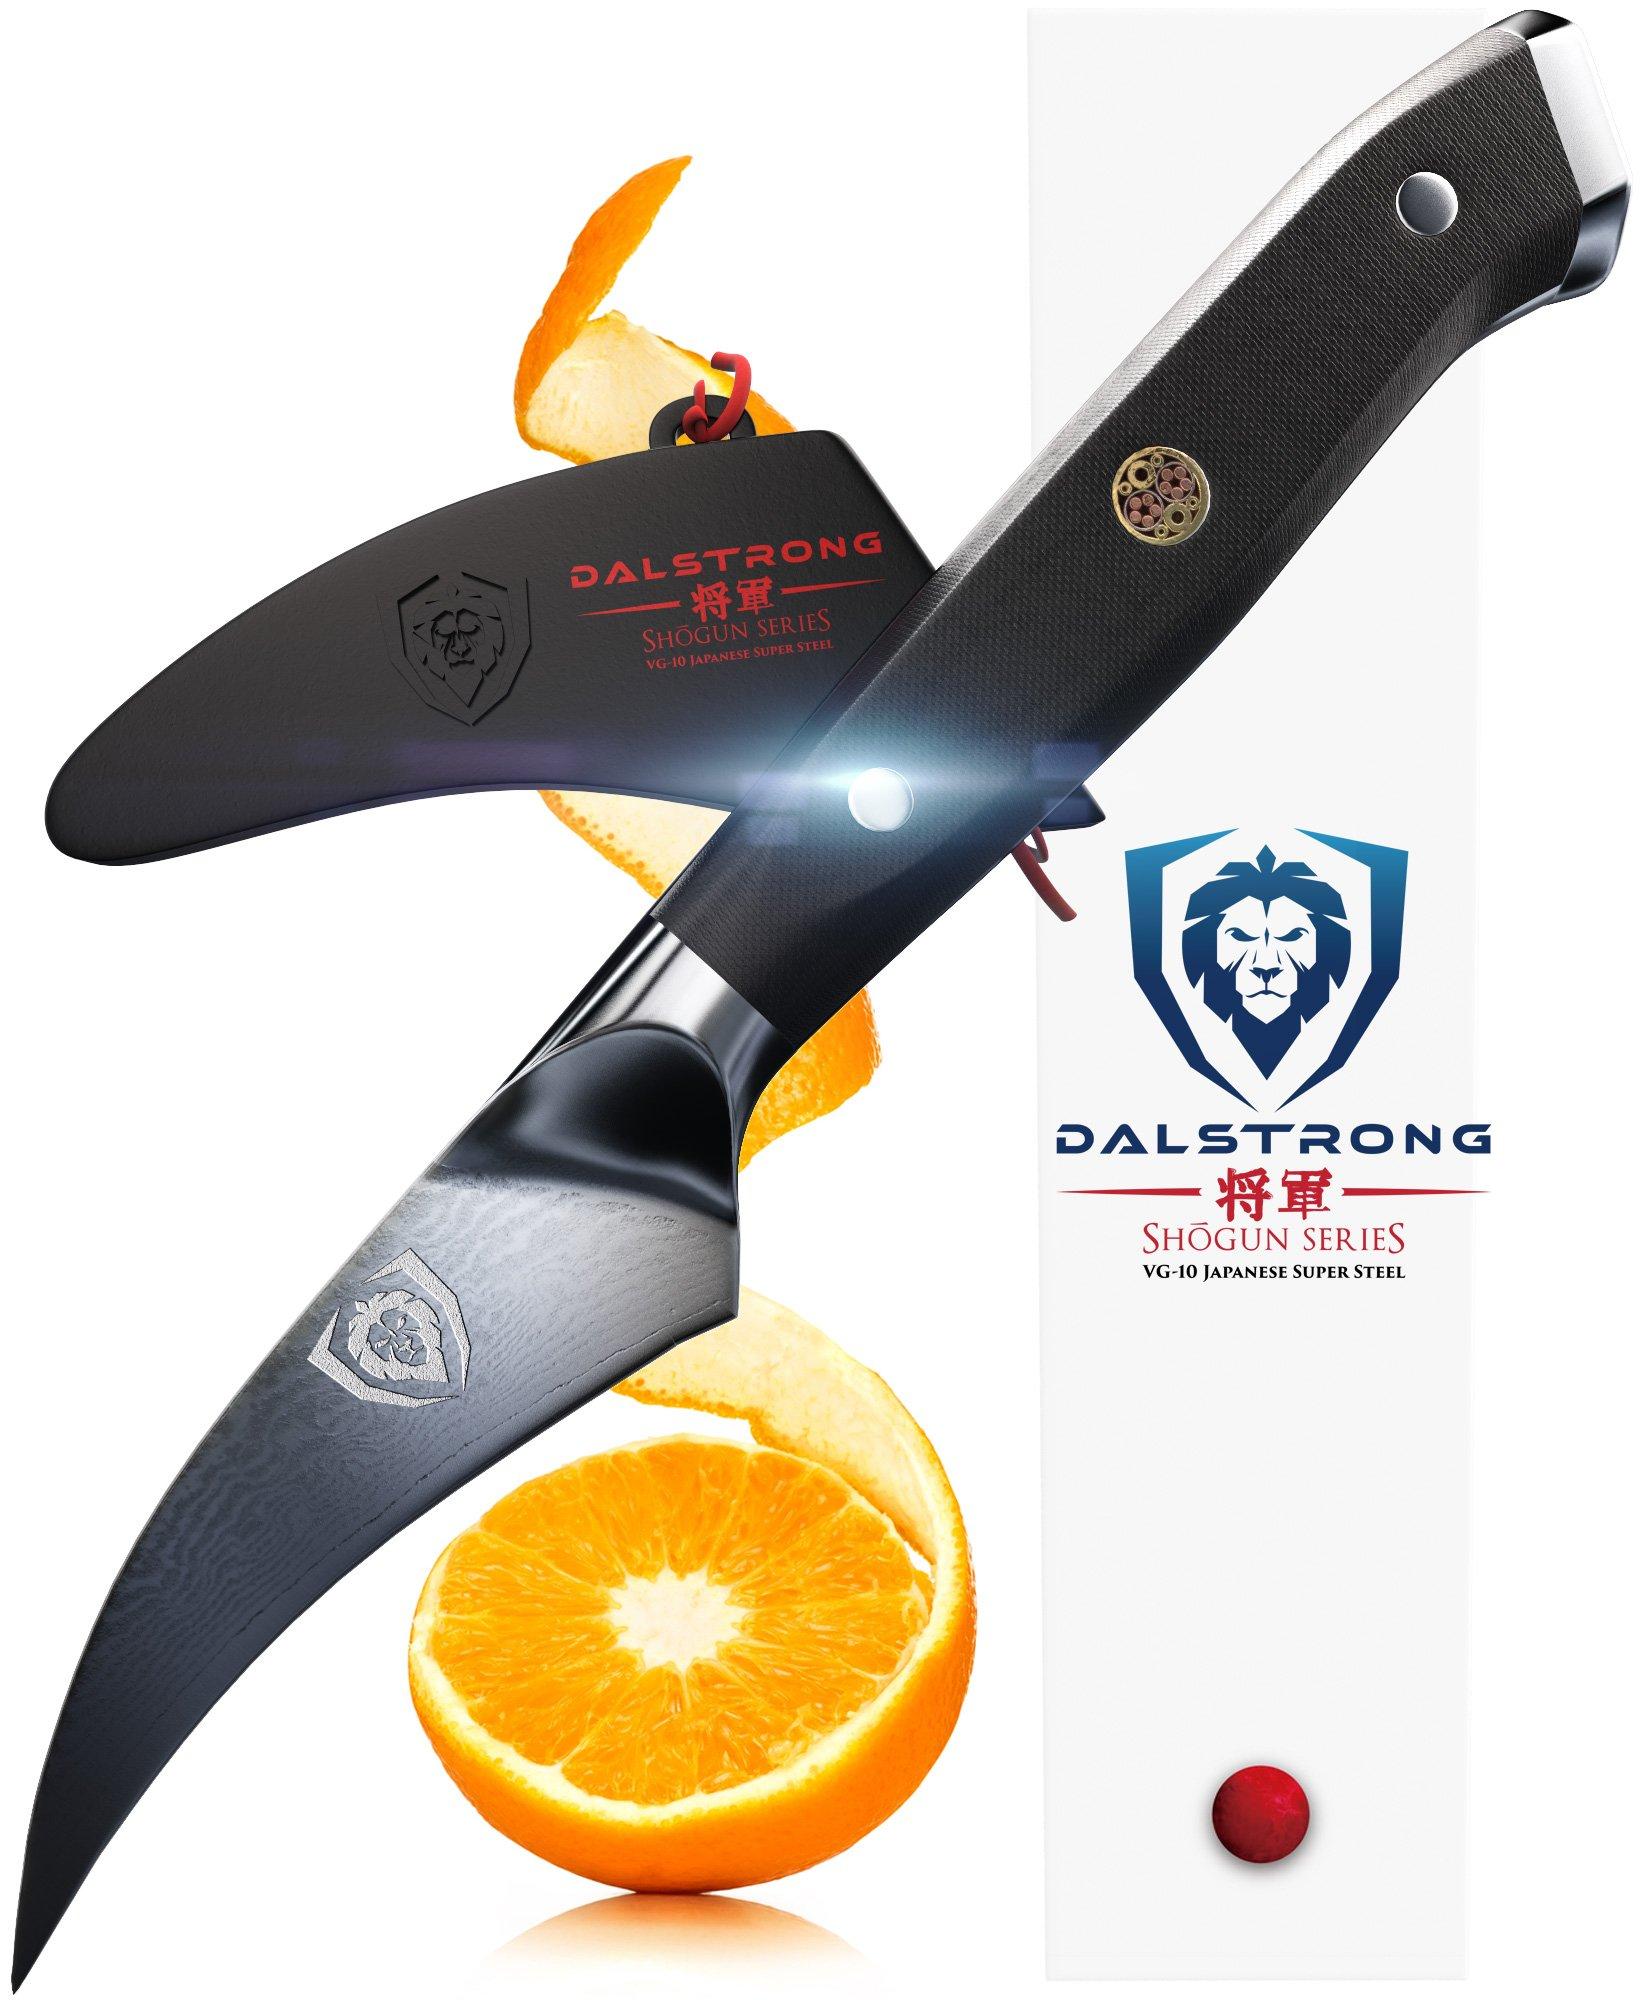 DALSTRONG Bird's Beak Paring Peeling Tourne Knife - Shogun Series - Japanese AUS-10V - Vacuum Heat Treated - 3'' Peeler - Guard